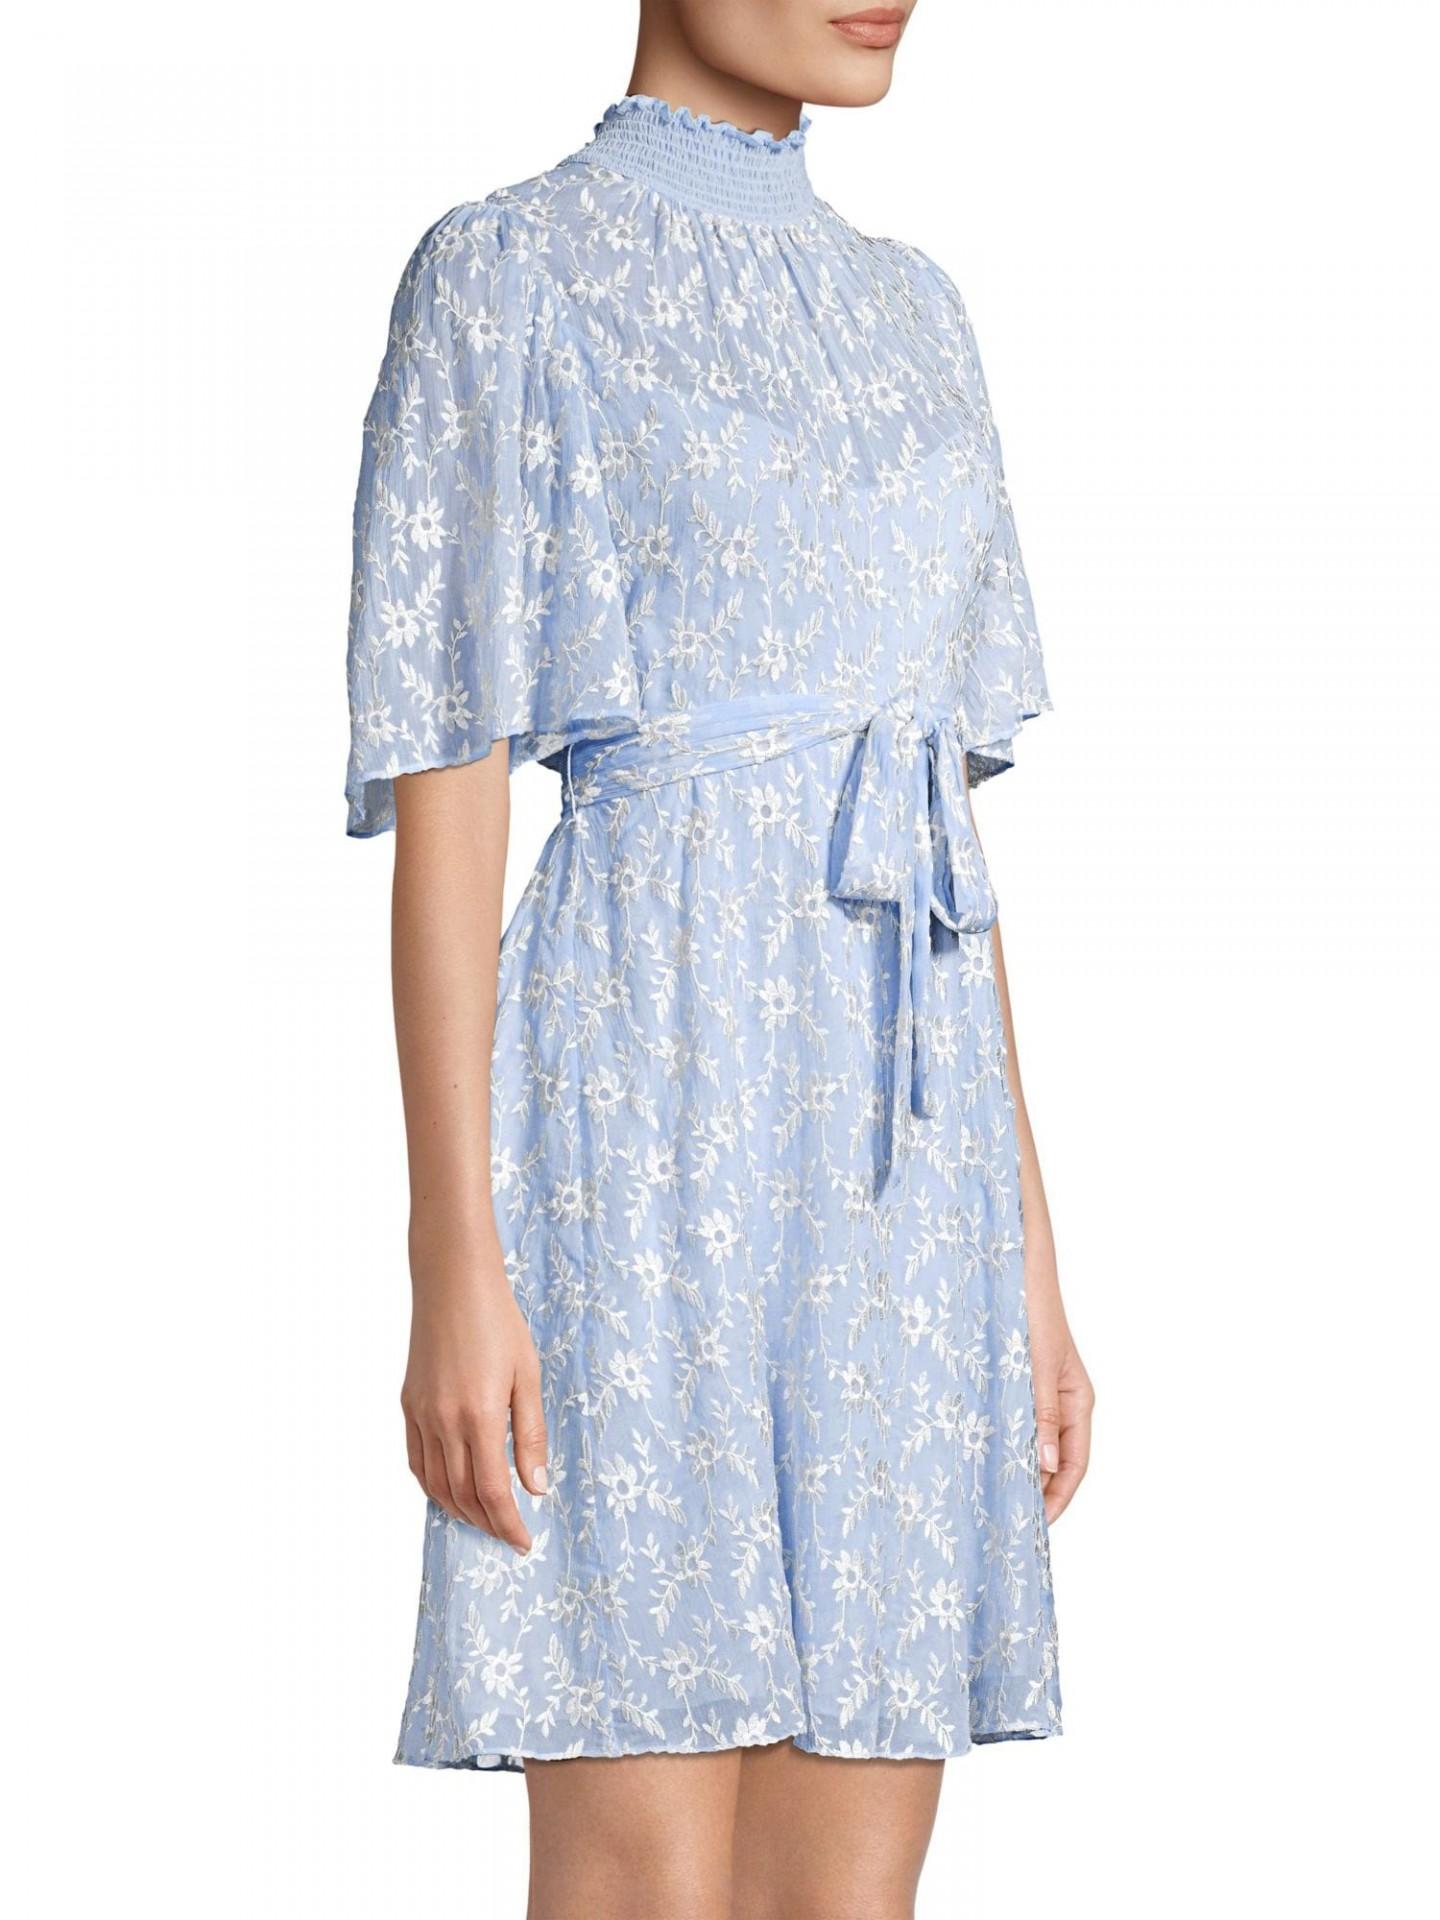 REBECCA TAYLOR Vine Embroidered Dress